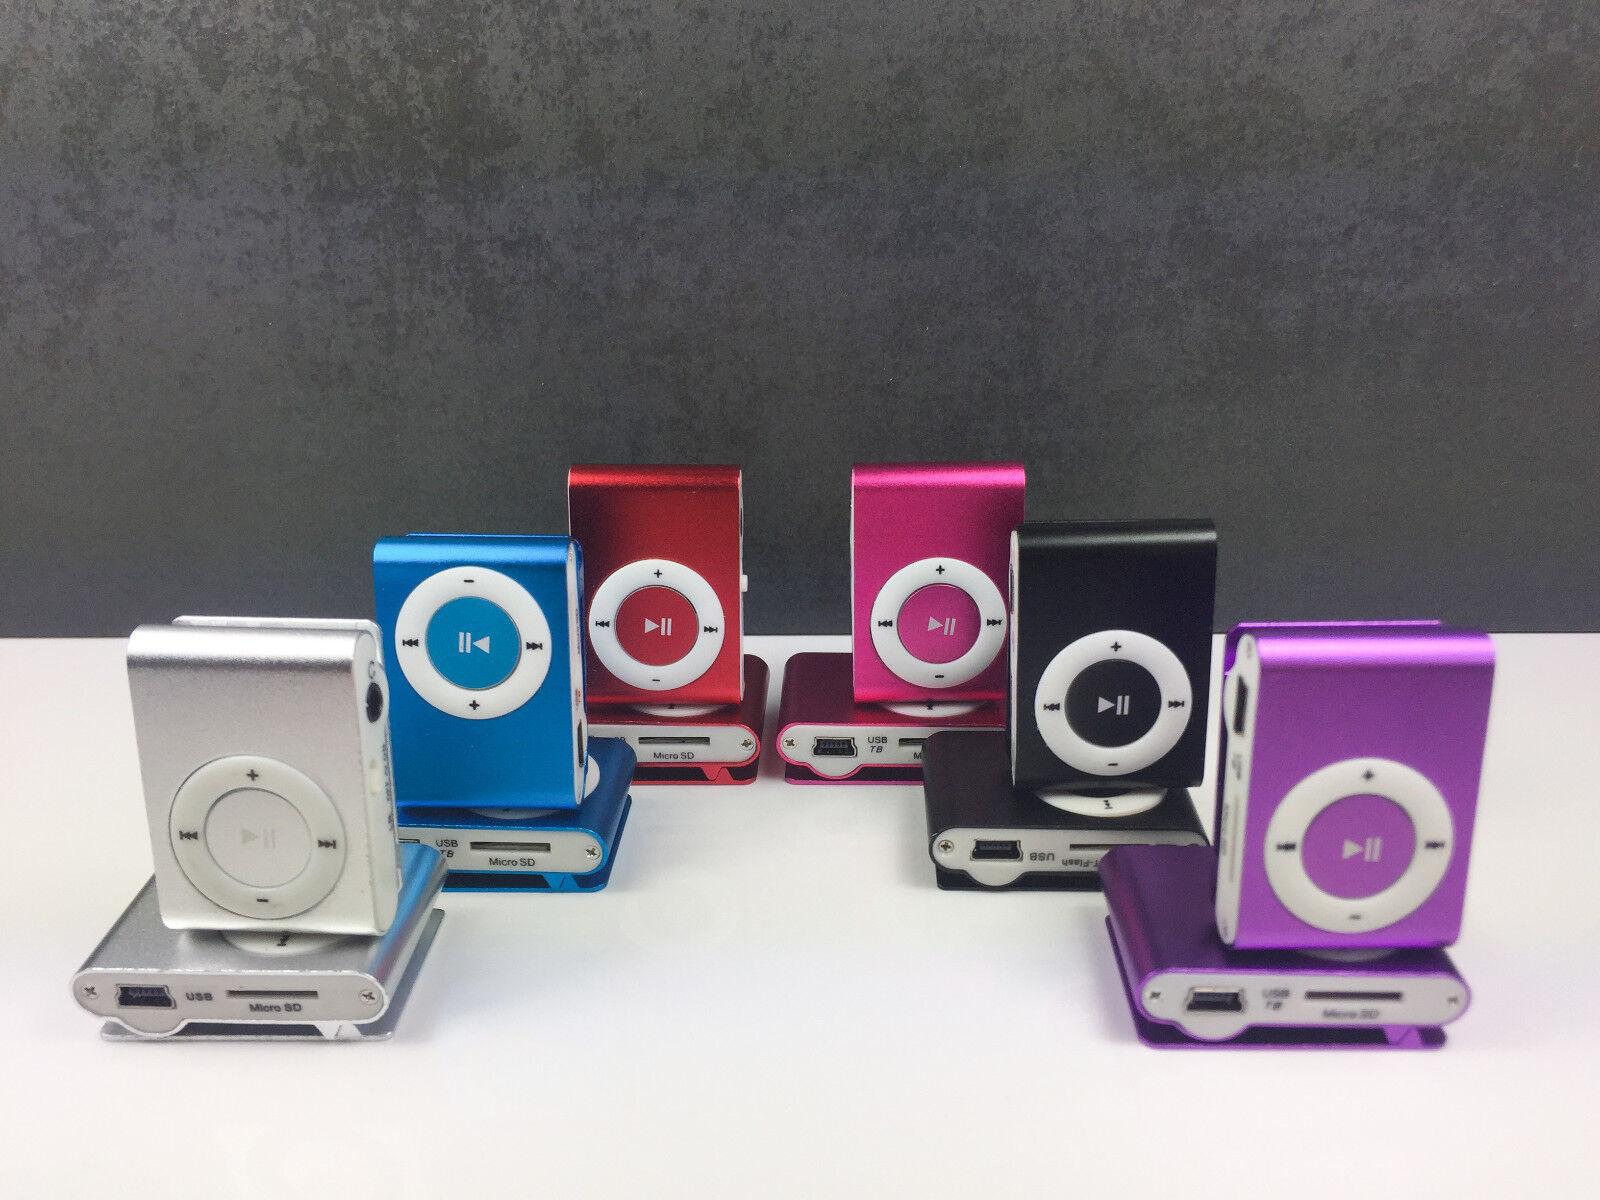 MP3 Player Clip Funktion tragbar stylish 6 Farben 3,5MM AUX Micro SD bis 32 GB !